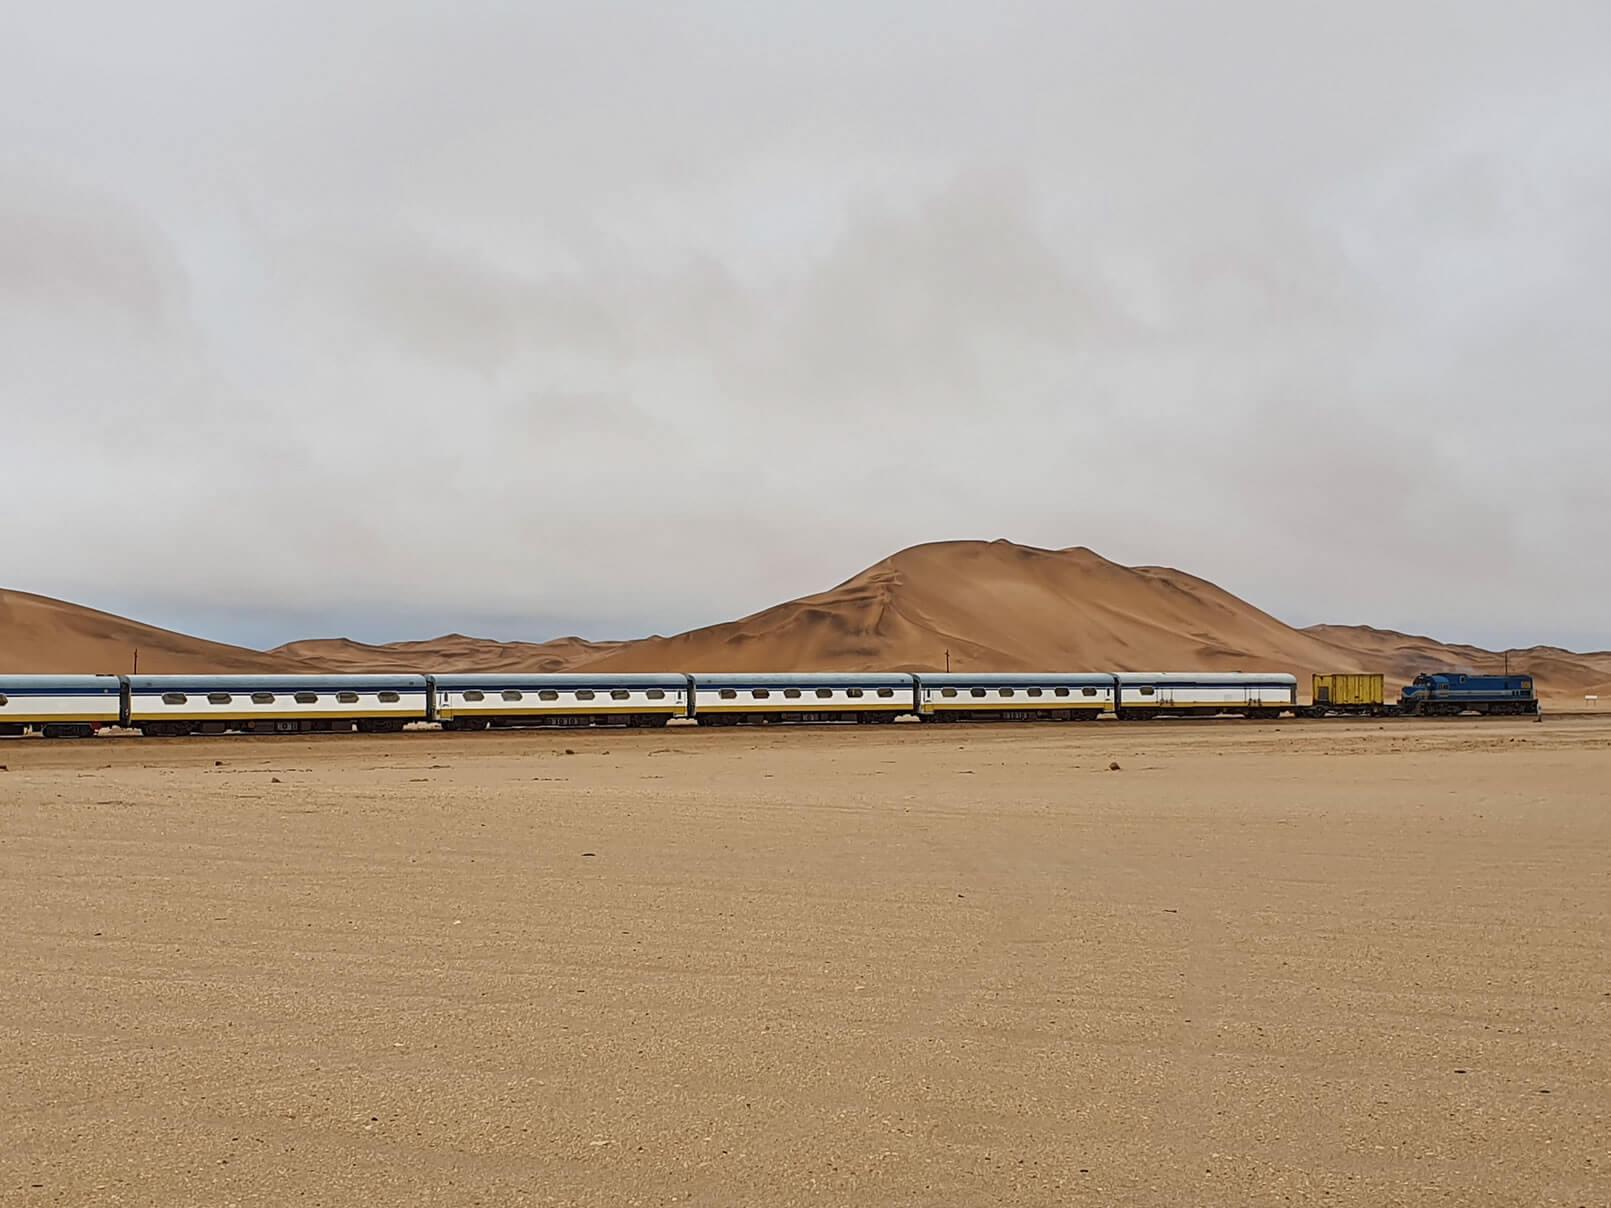 desert express train namibia travel